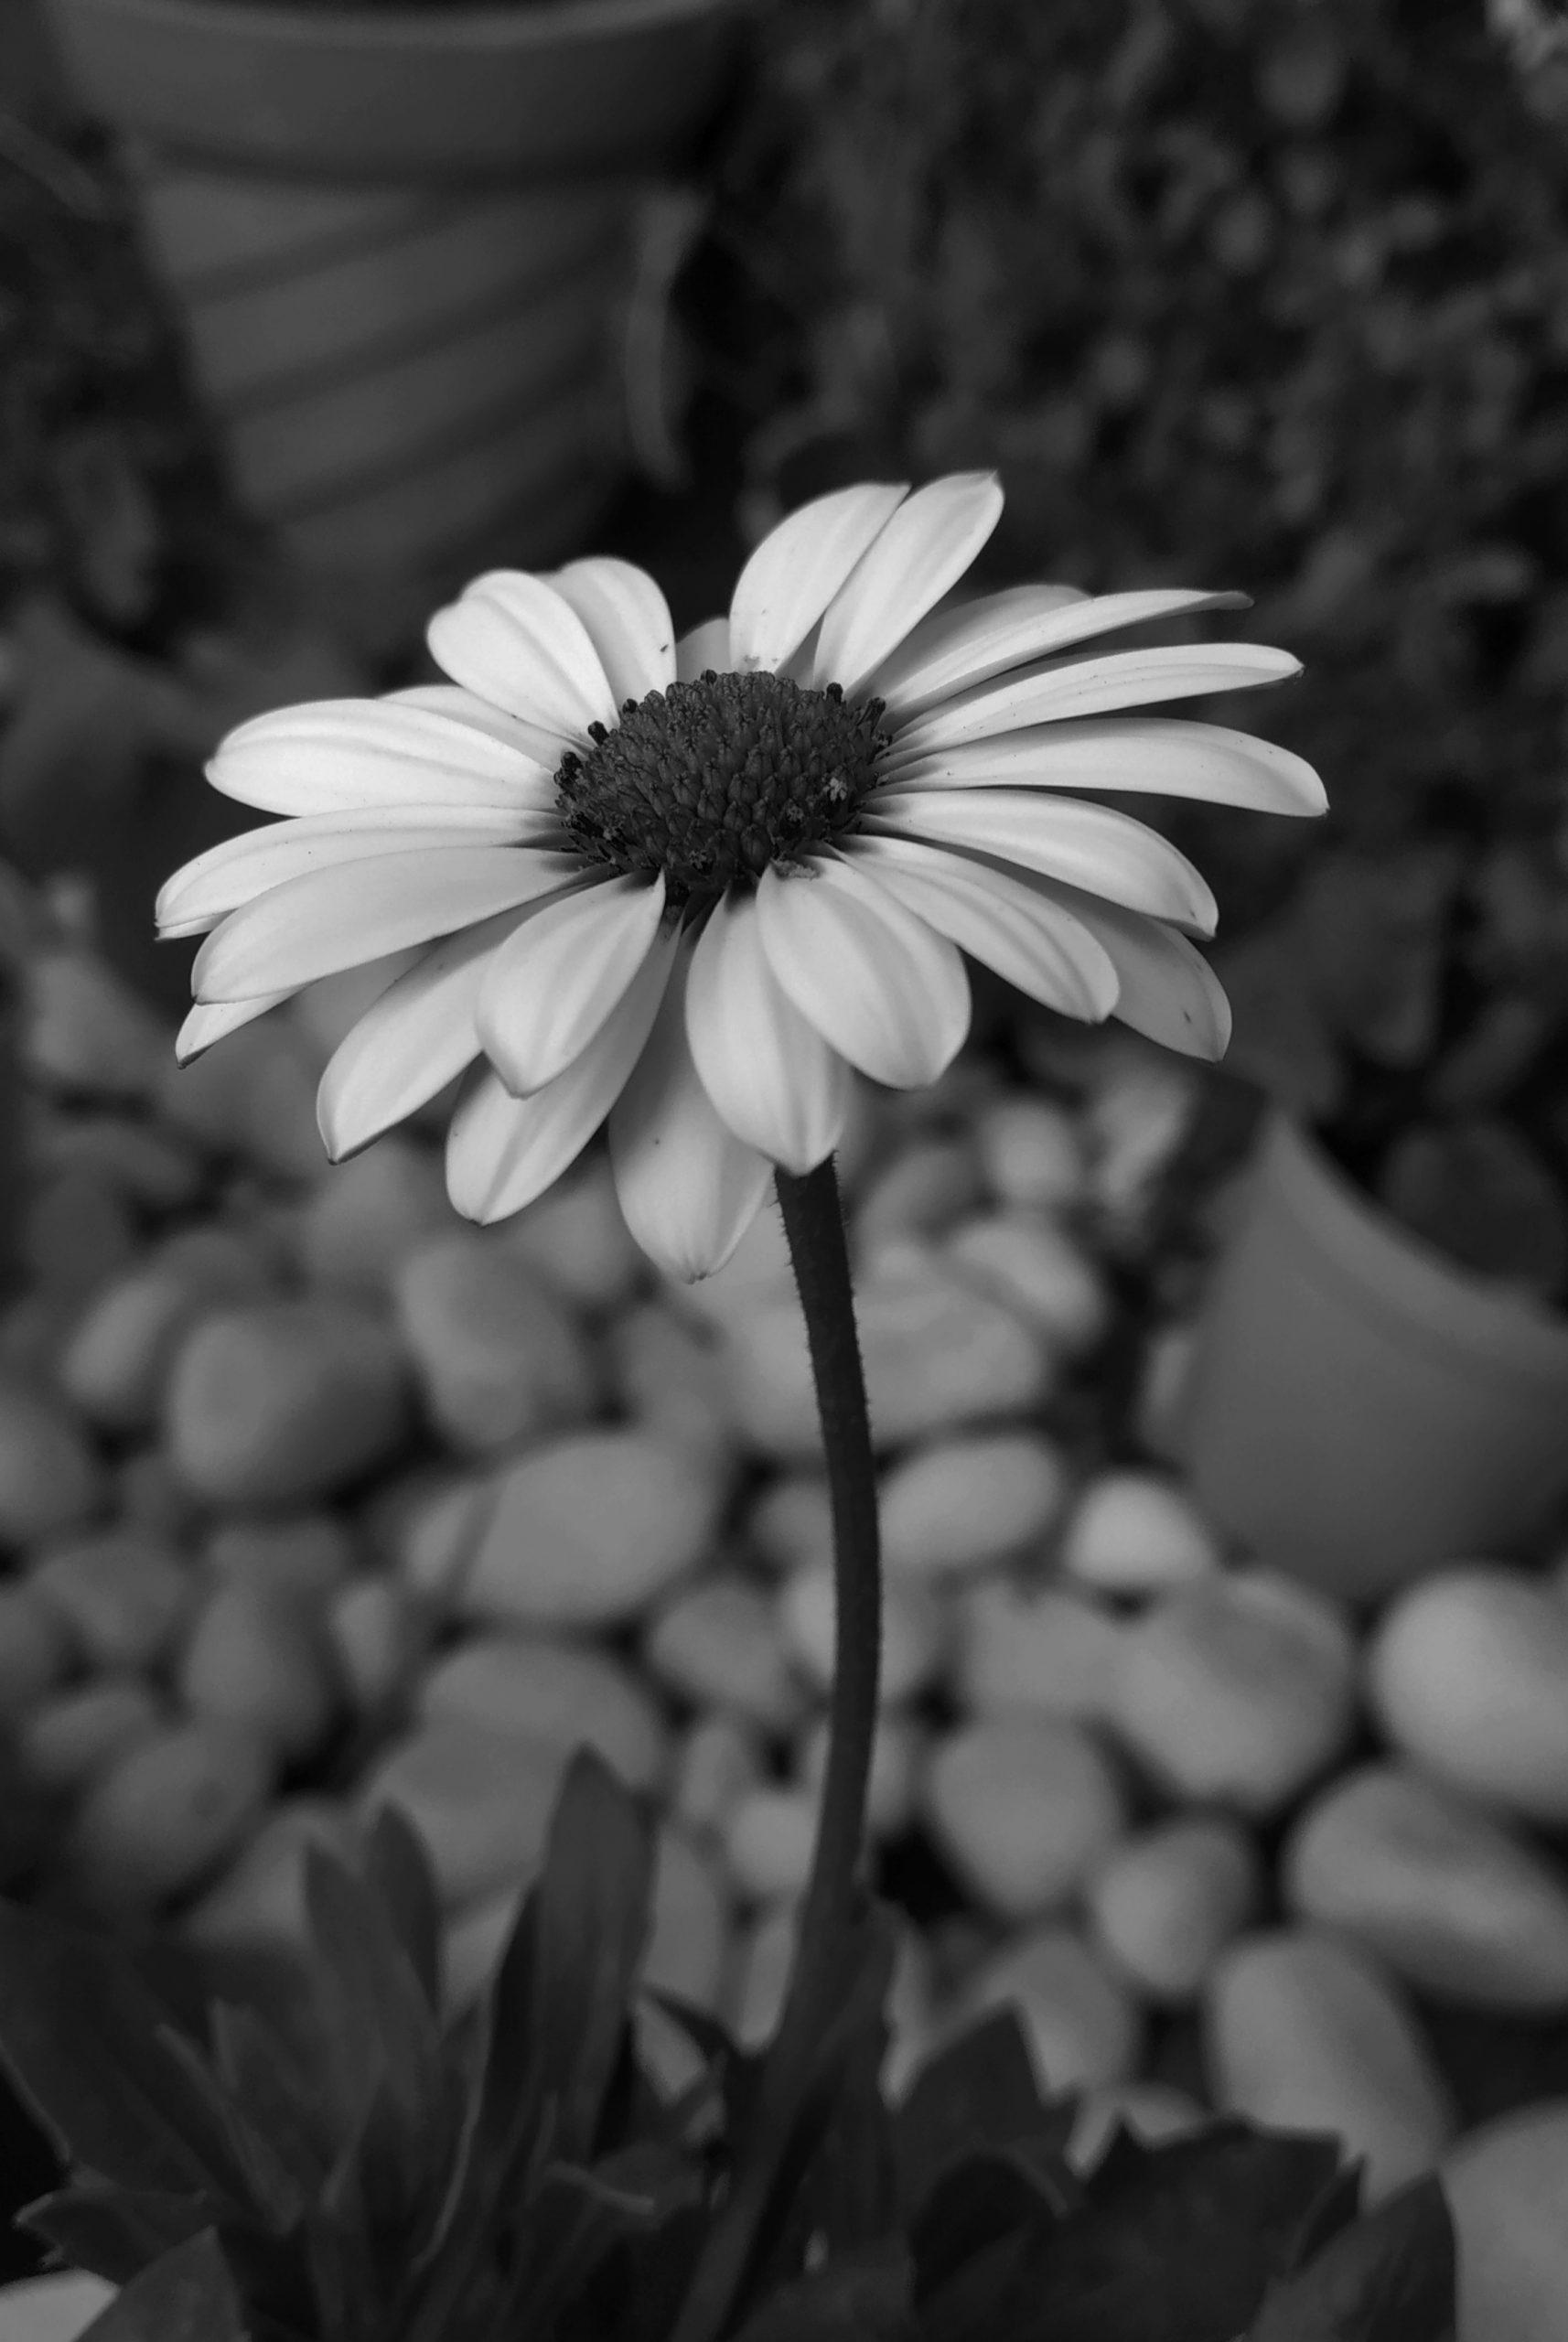 Daisy flower portrait